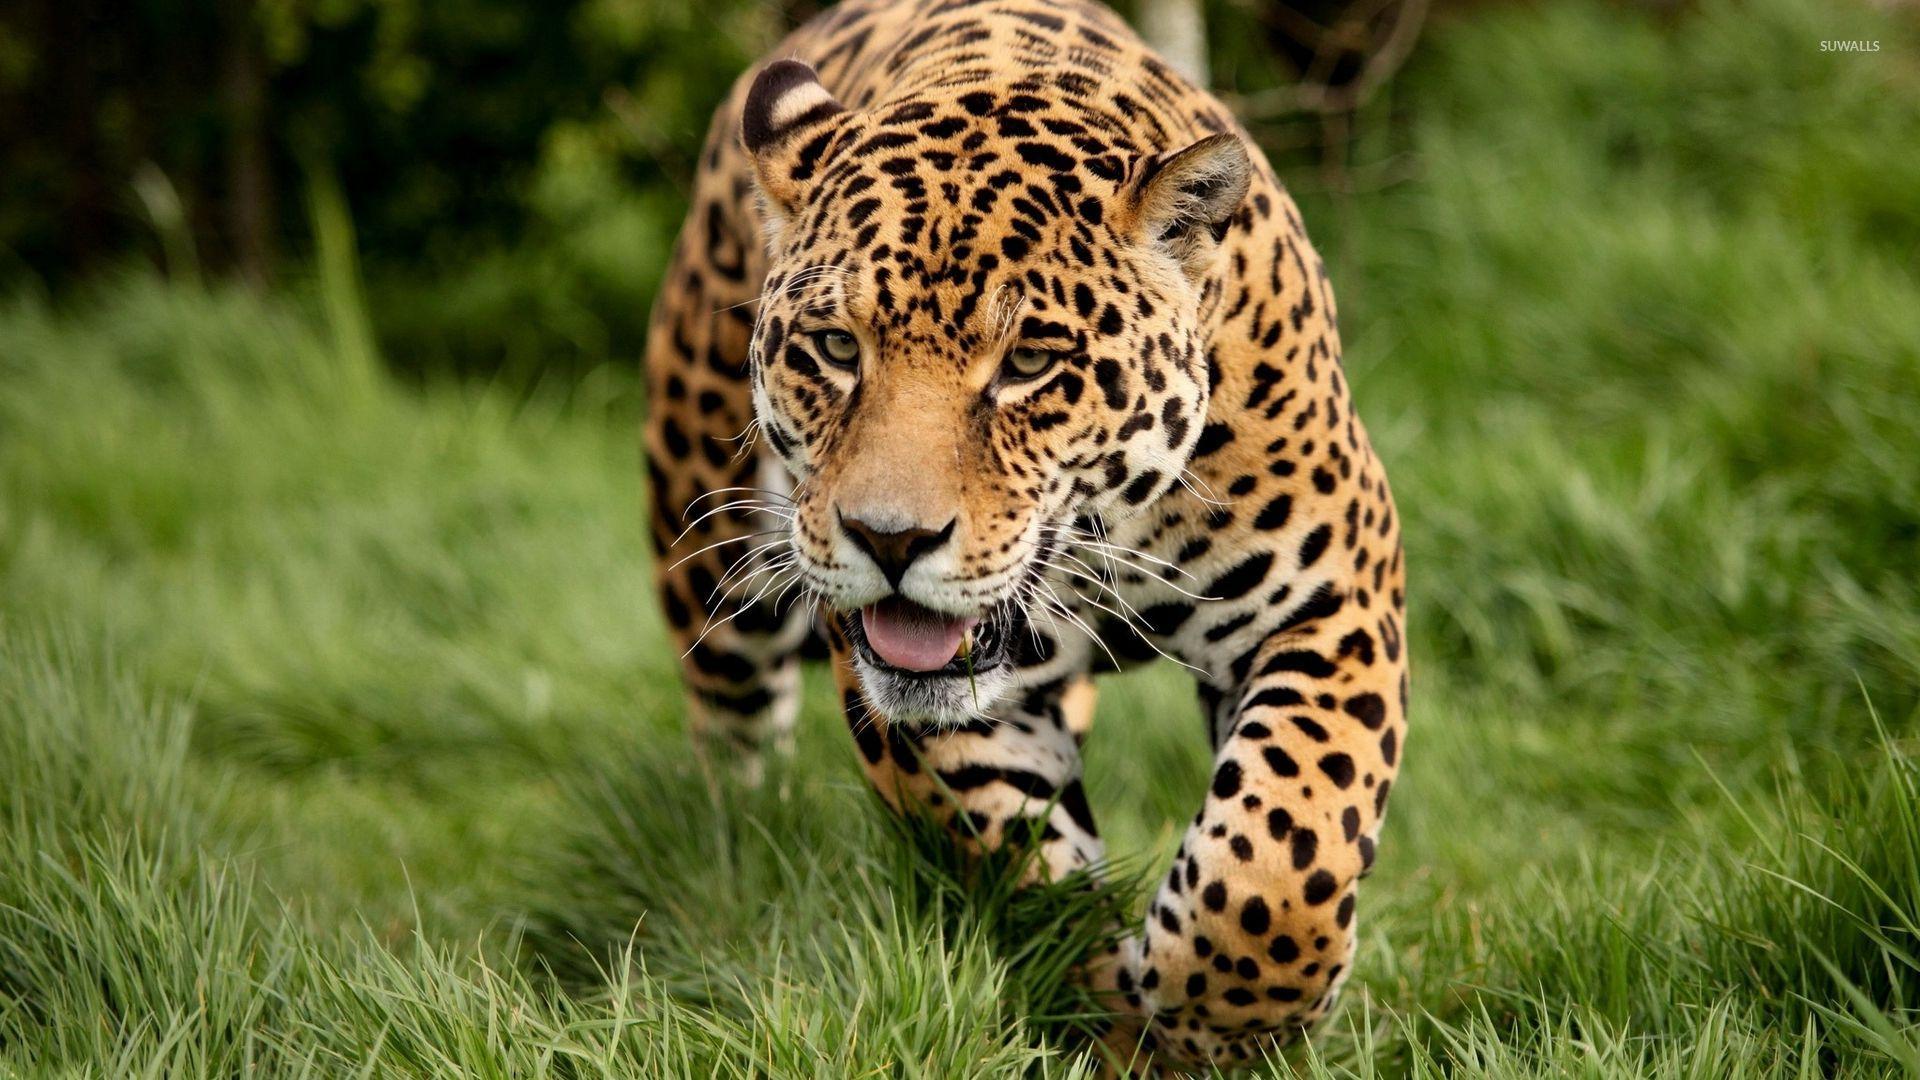 Cheetah Photos Animals Hd Wallpapers Free Download: Leopard Sneaking Through The Green Grass Wallpaper